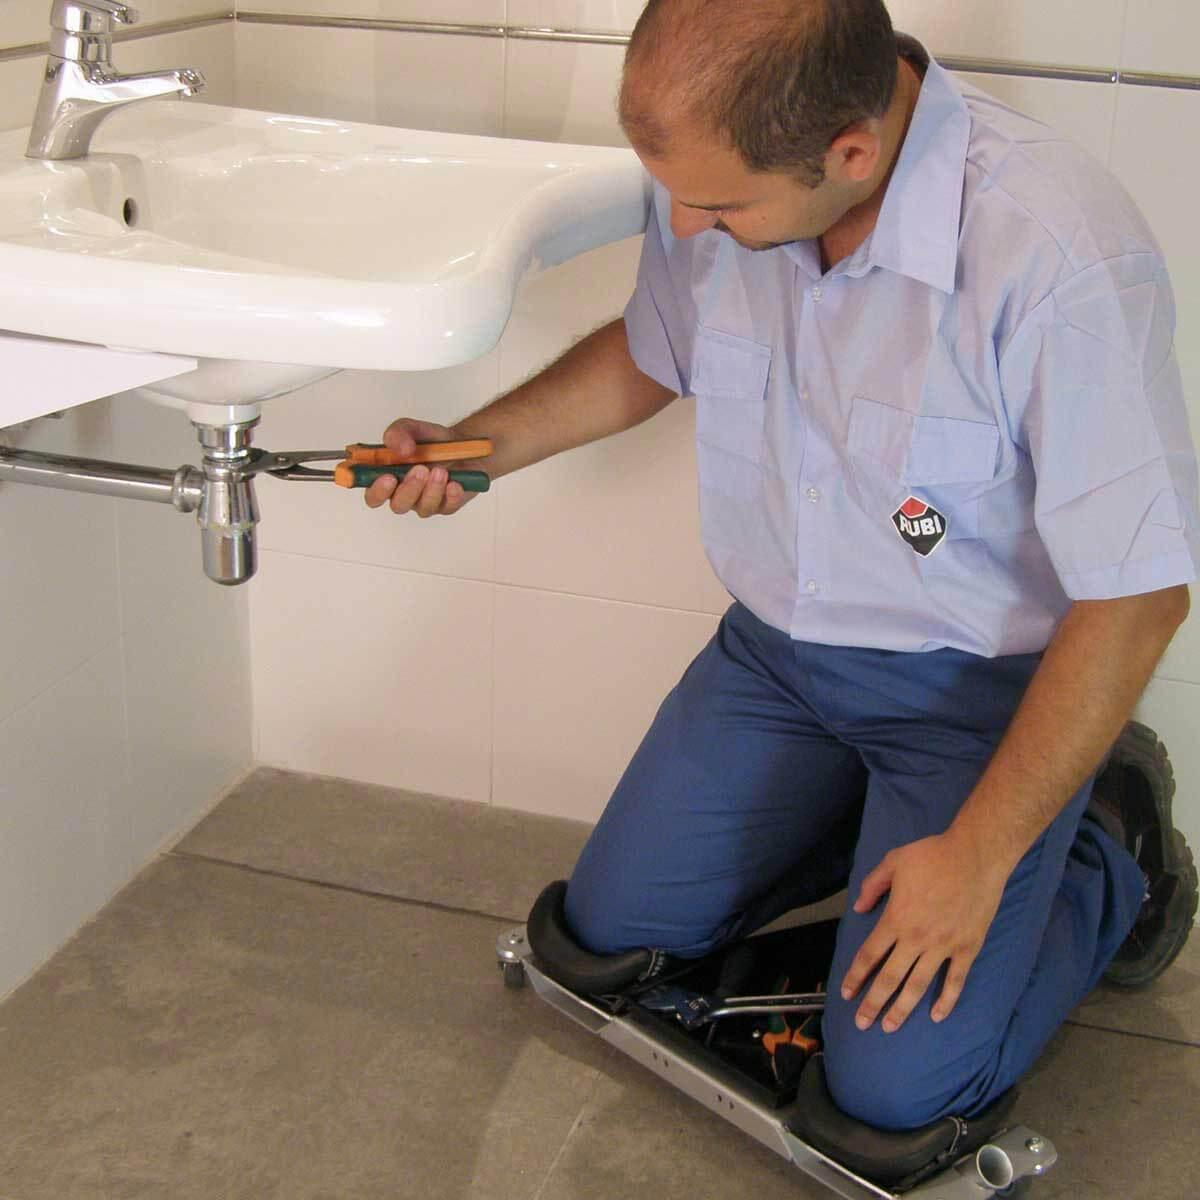 Rubi SR1 Ergonomic Knee Pad sink